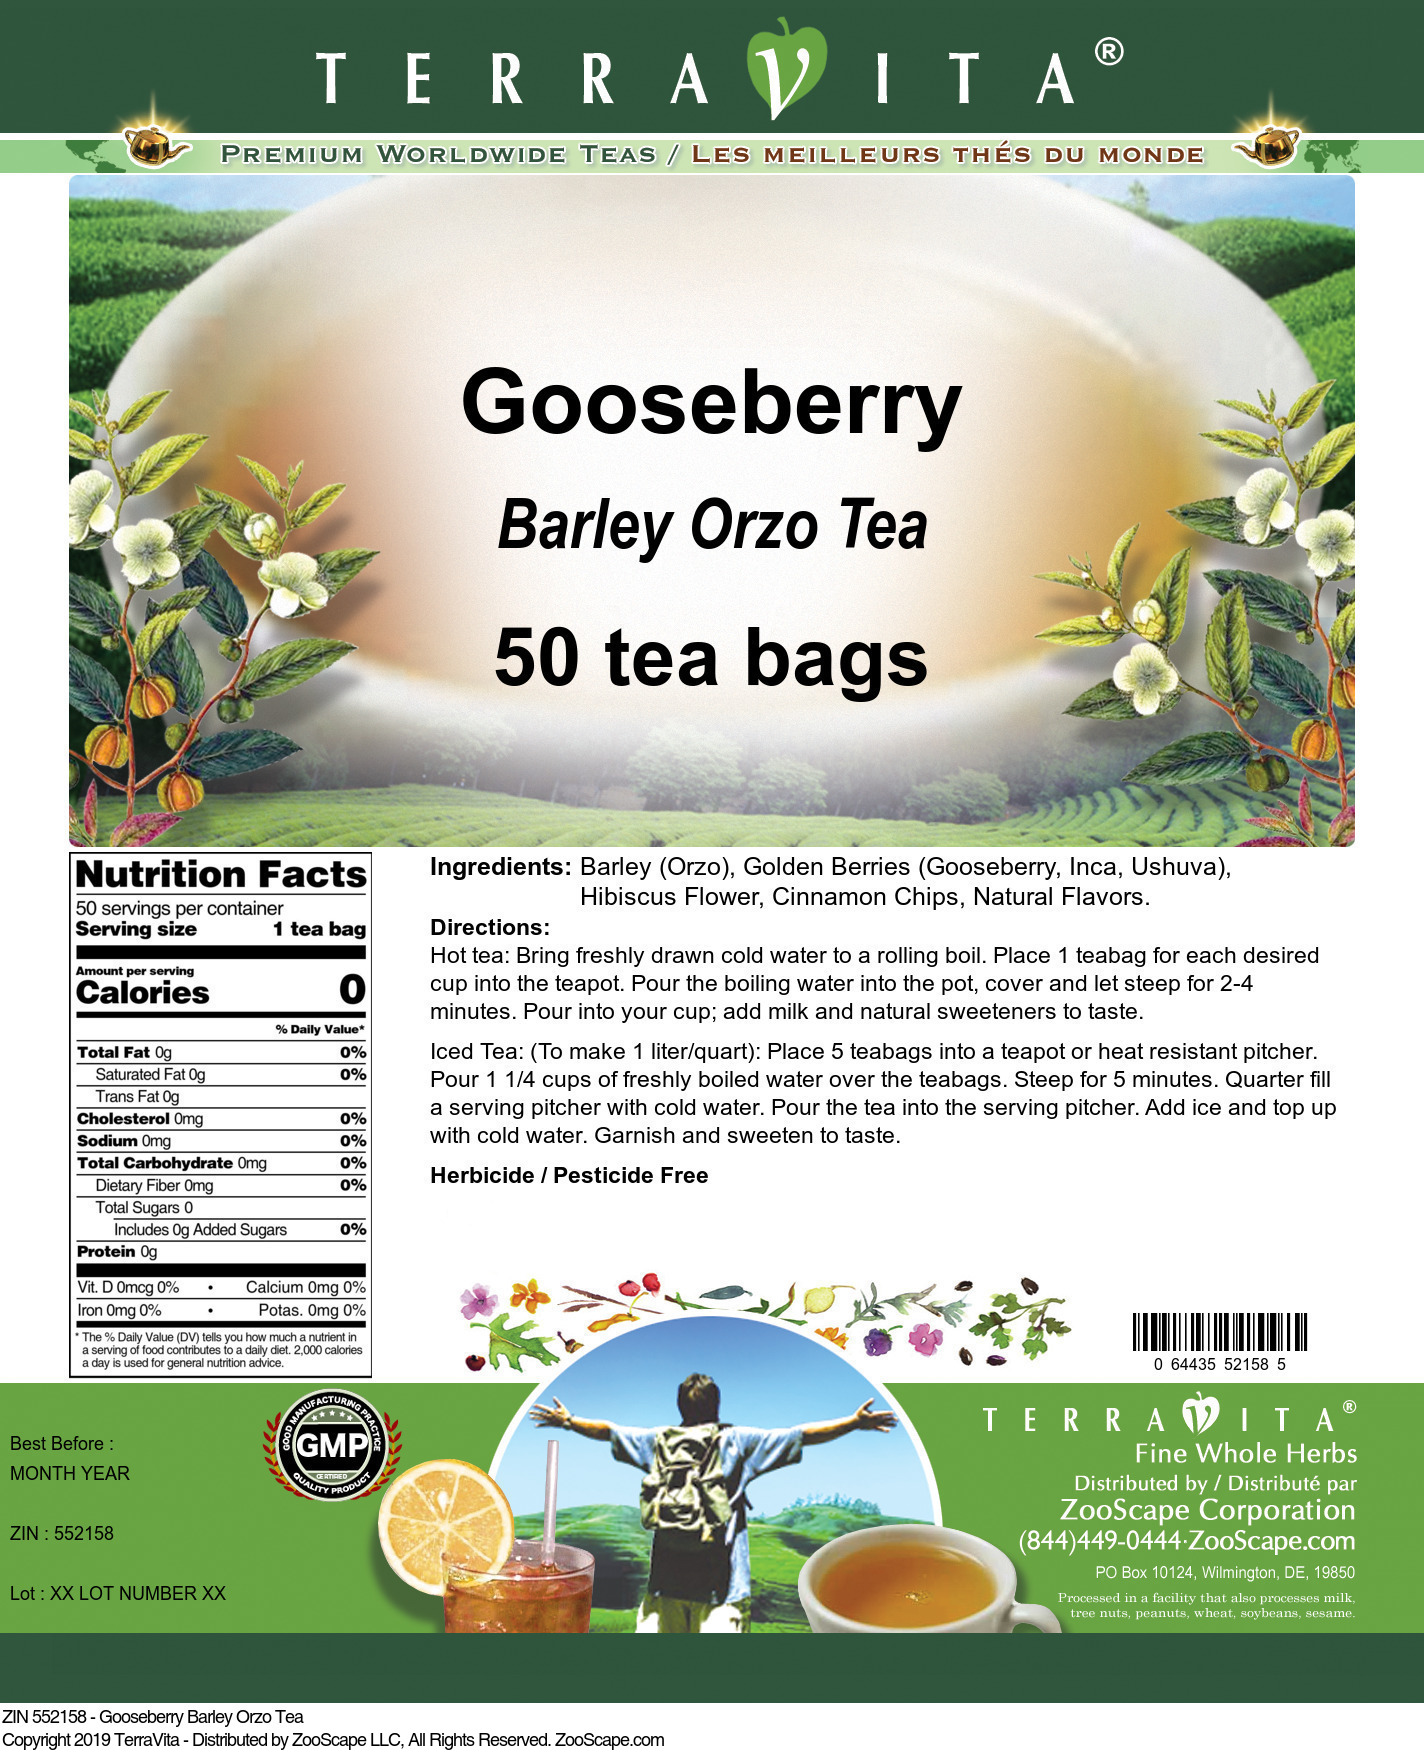 Gooseberry Barley Orzo Tea